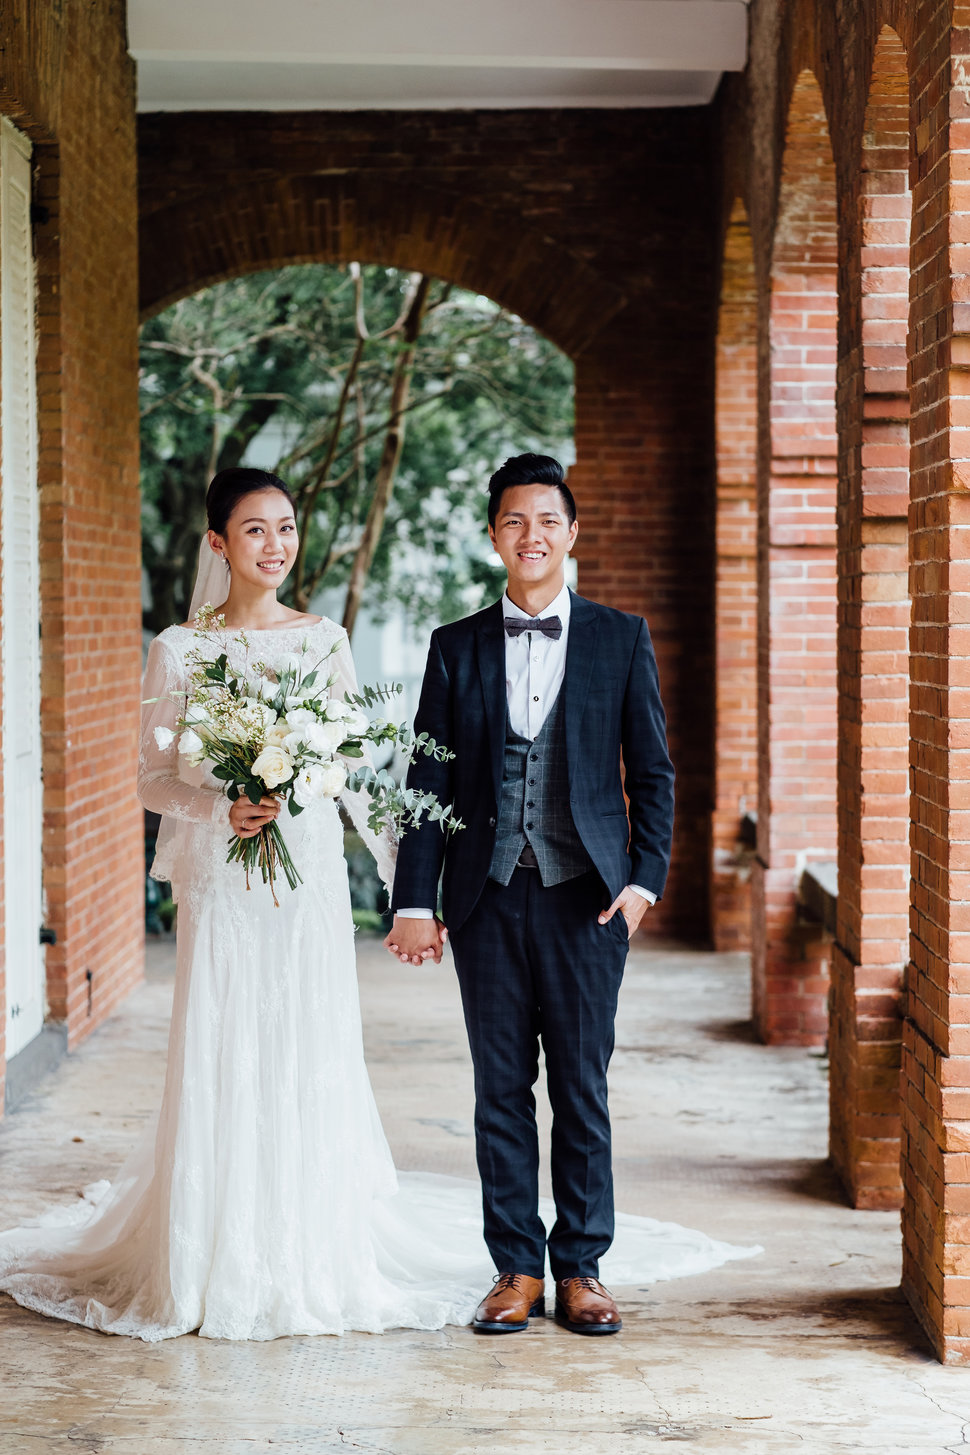 2017-07-22-15h08m04-DSCF5305 - Vicky Li 新娘秘書《結婚吧》